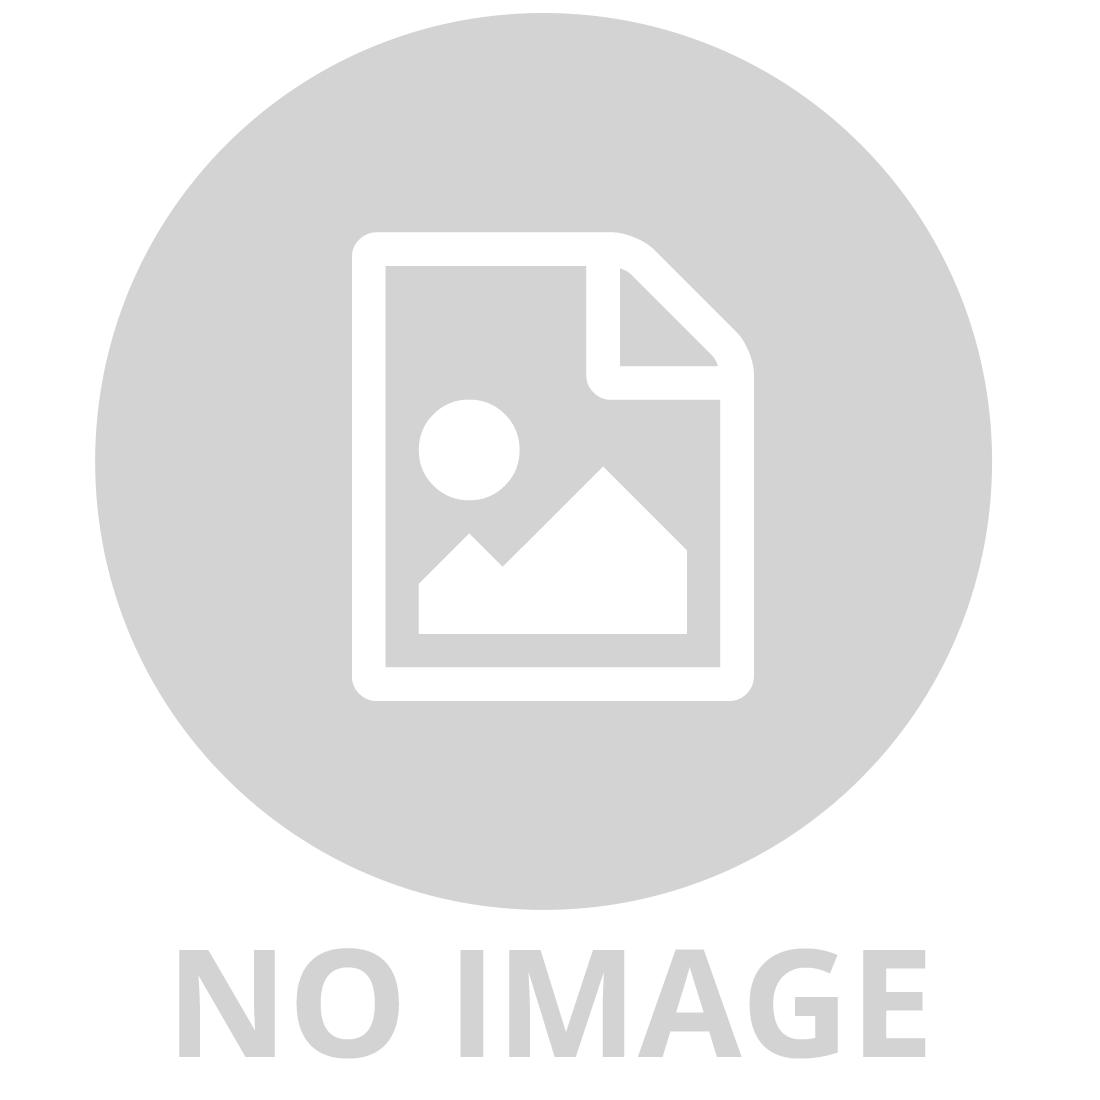 LEGO FRIENDS 41328 STEPHANIES BEDROOM